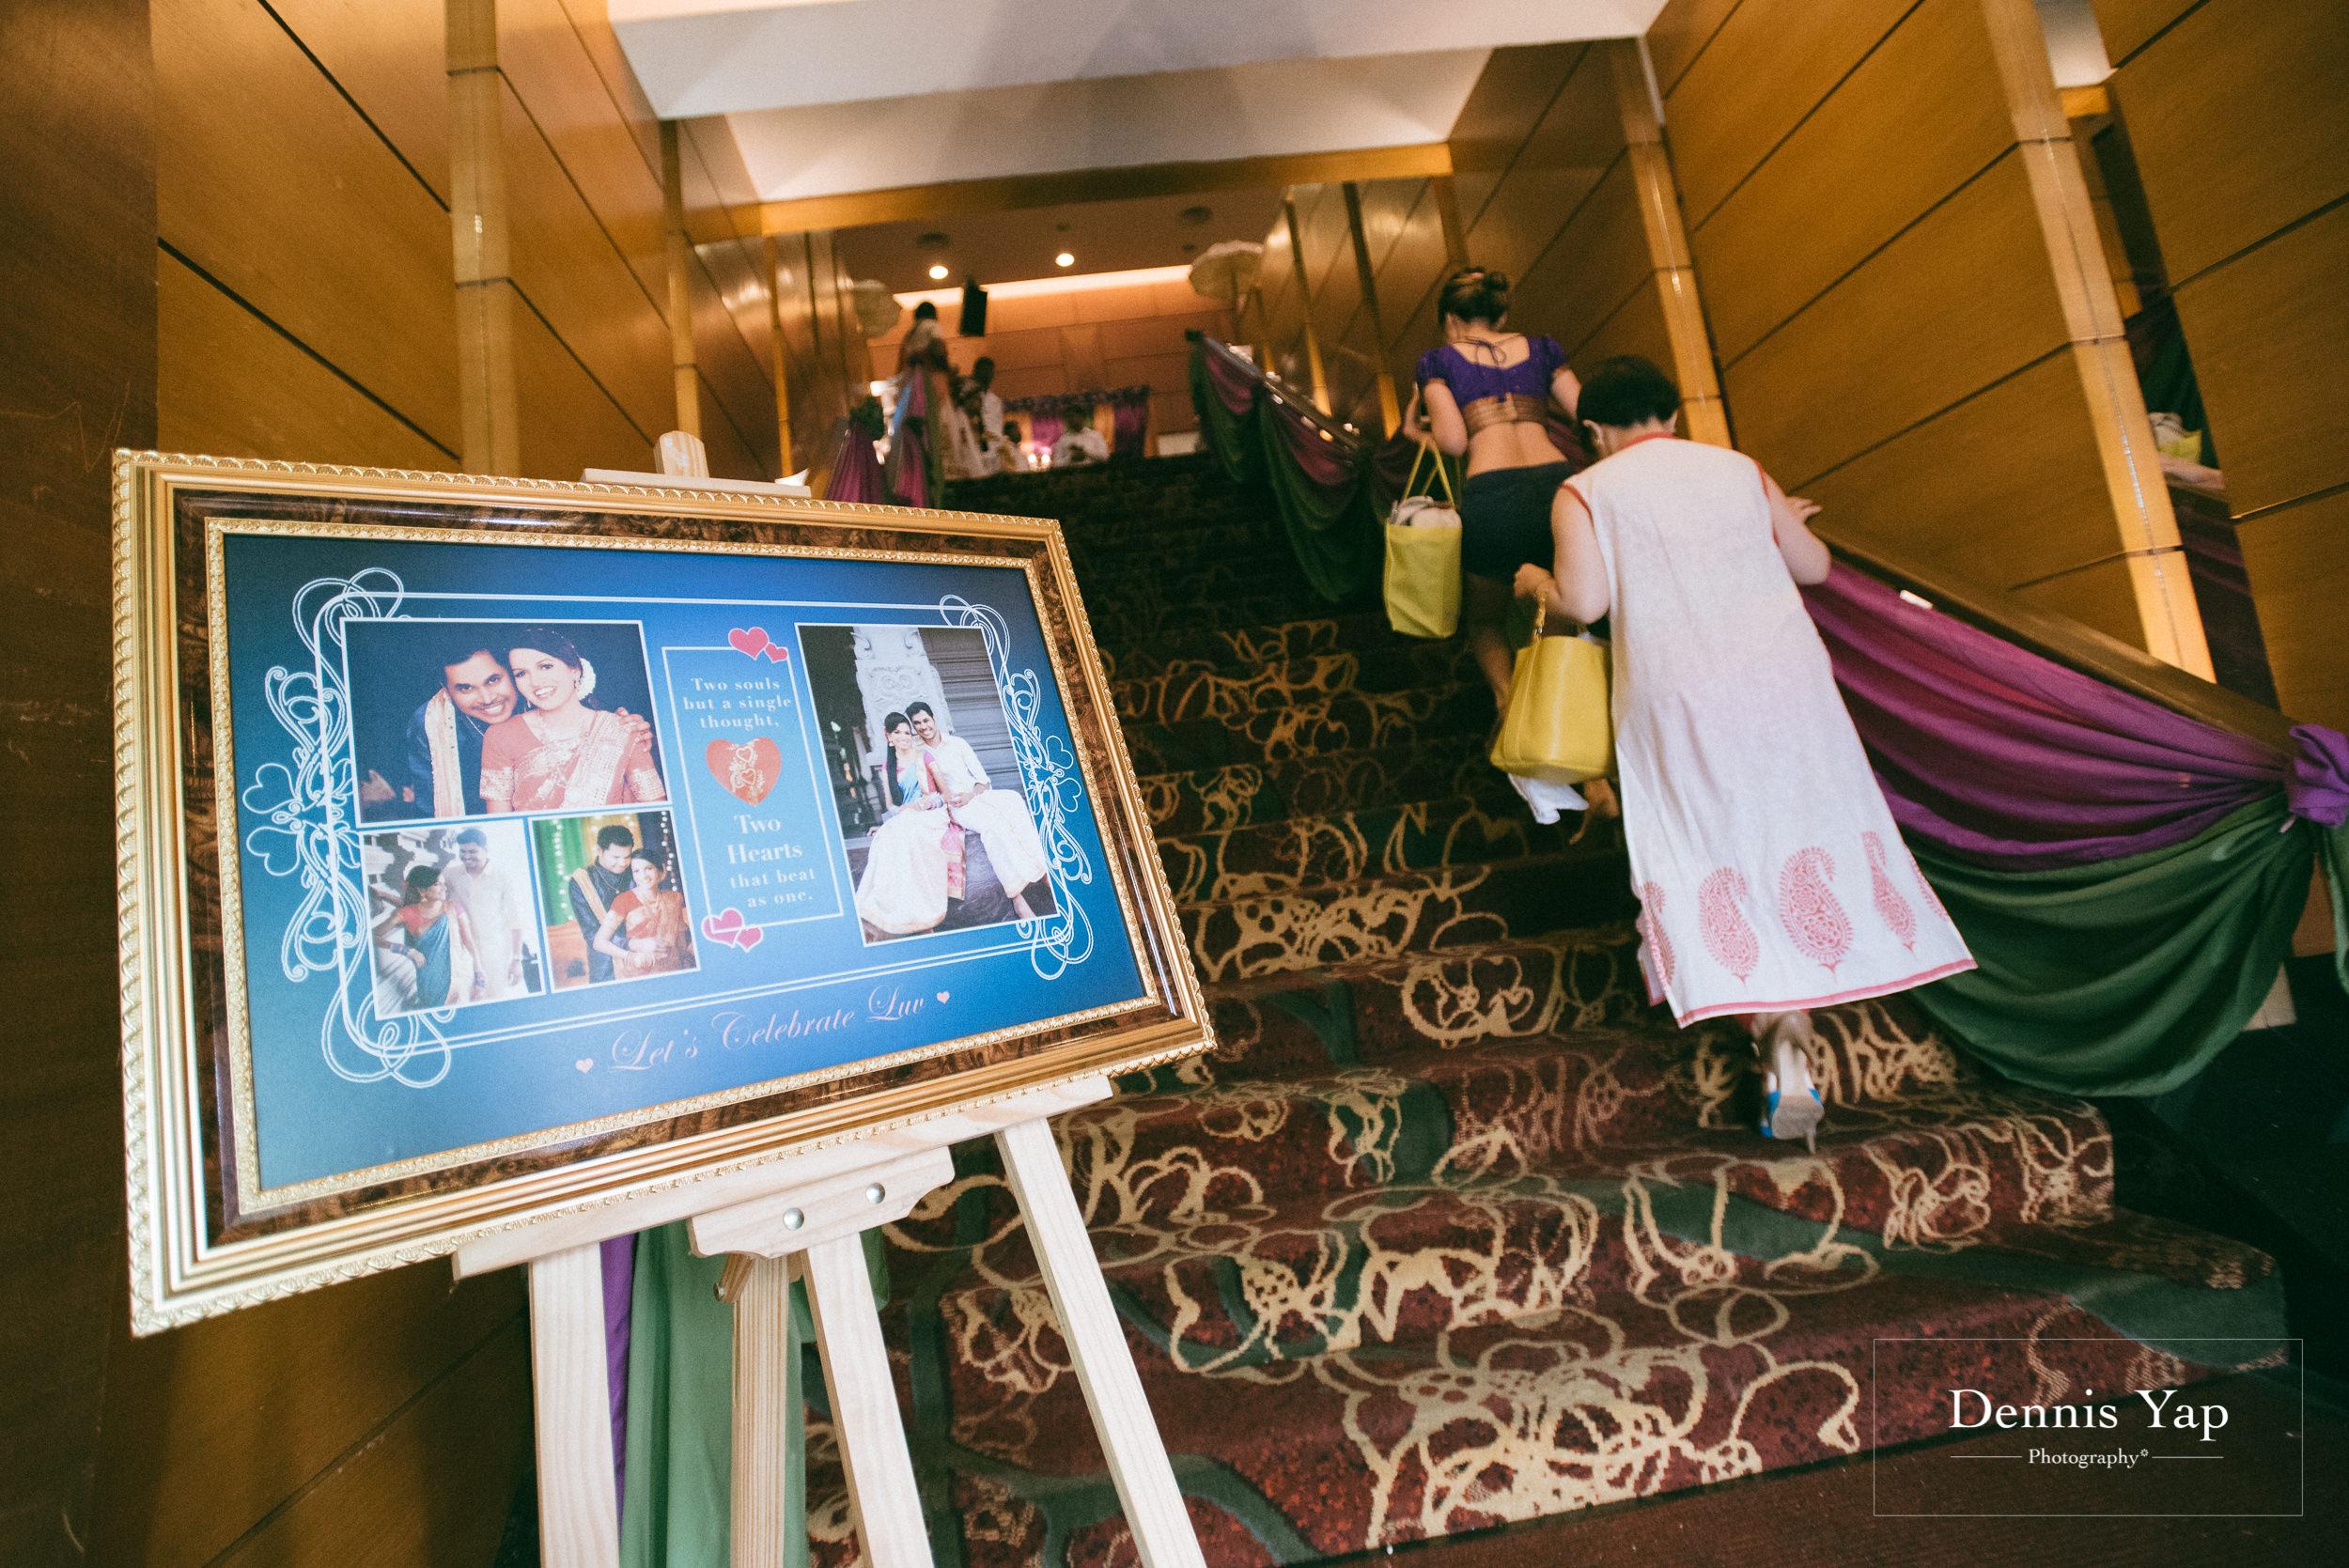 puvaneswaran cangitaa indian wedding ceremony ideal convention dennis yap photography malaysia-5.jpg